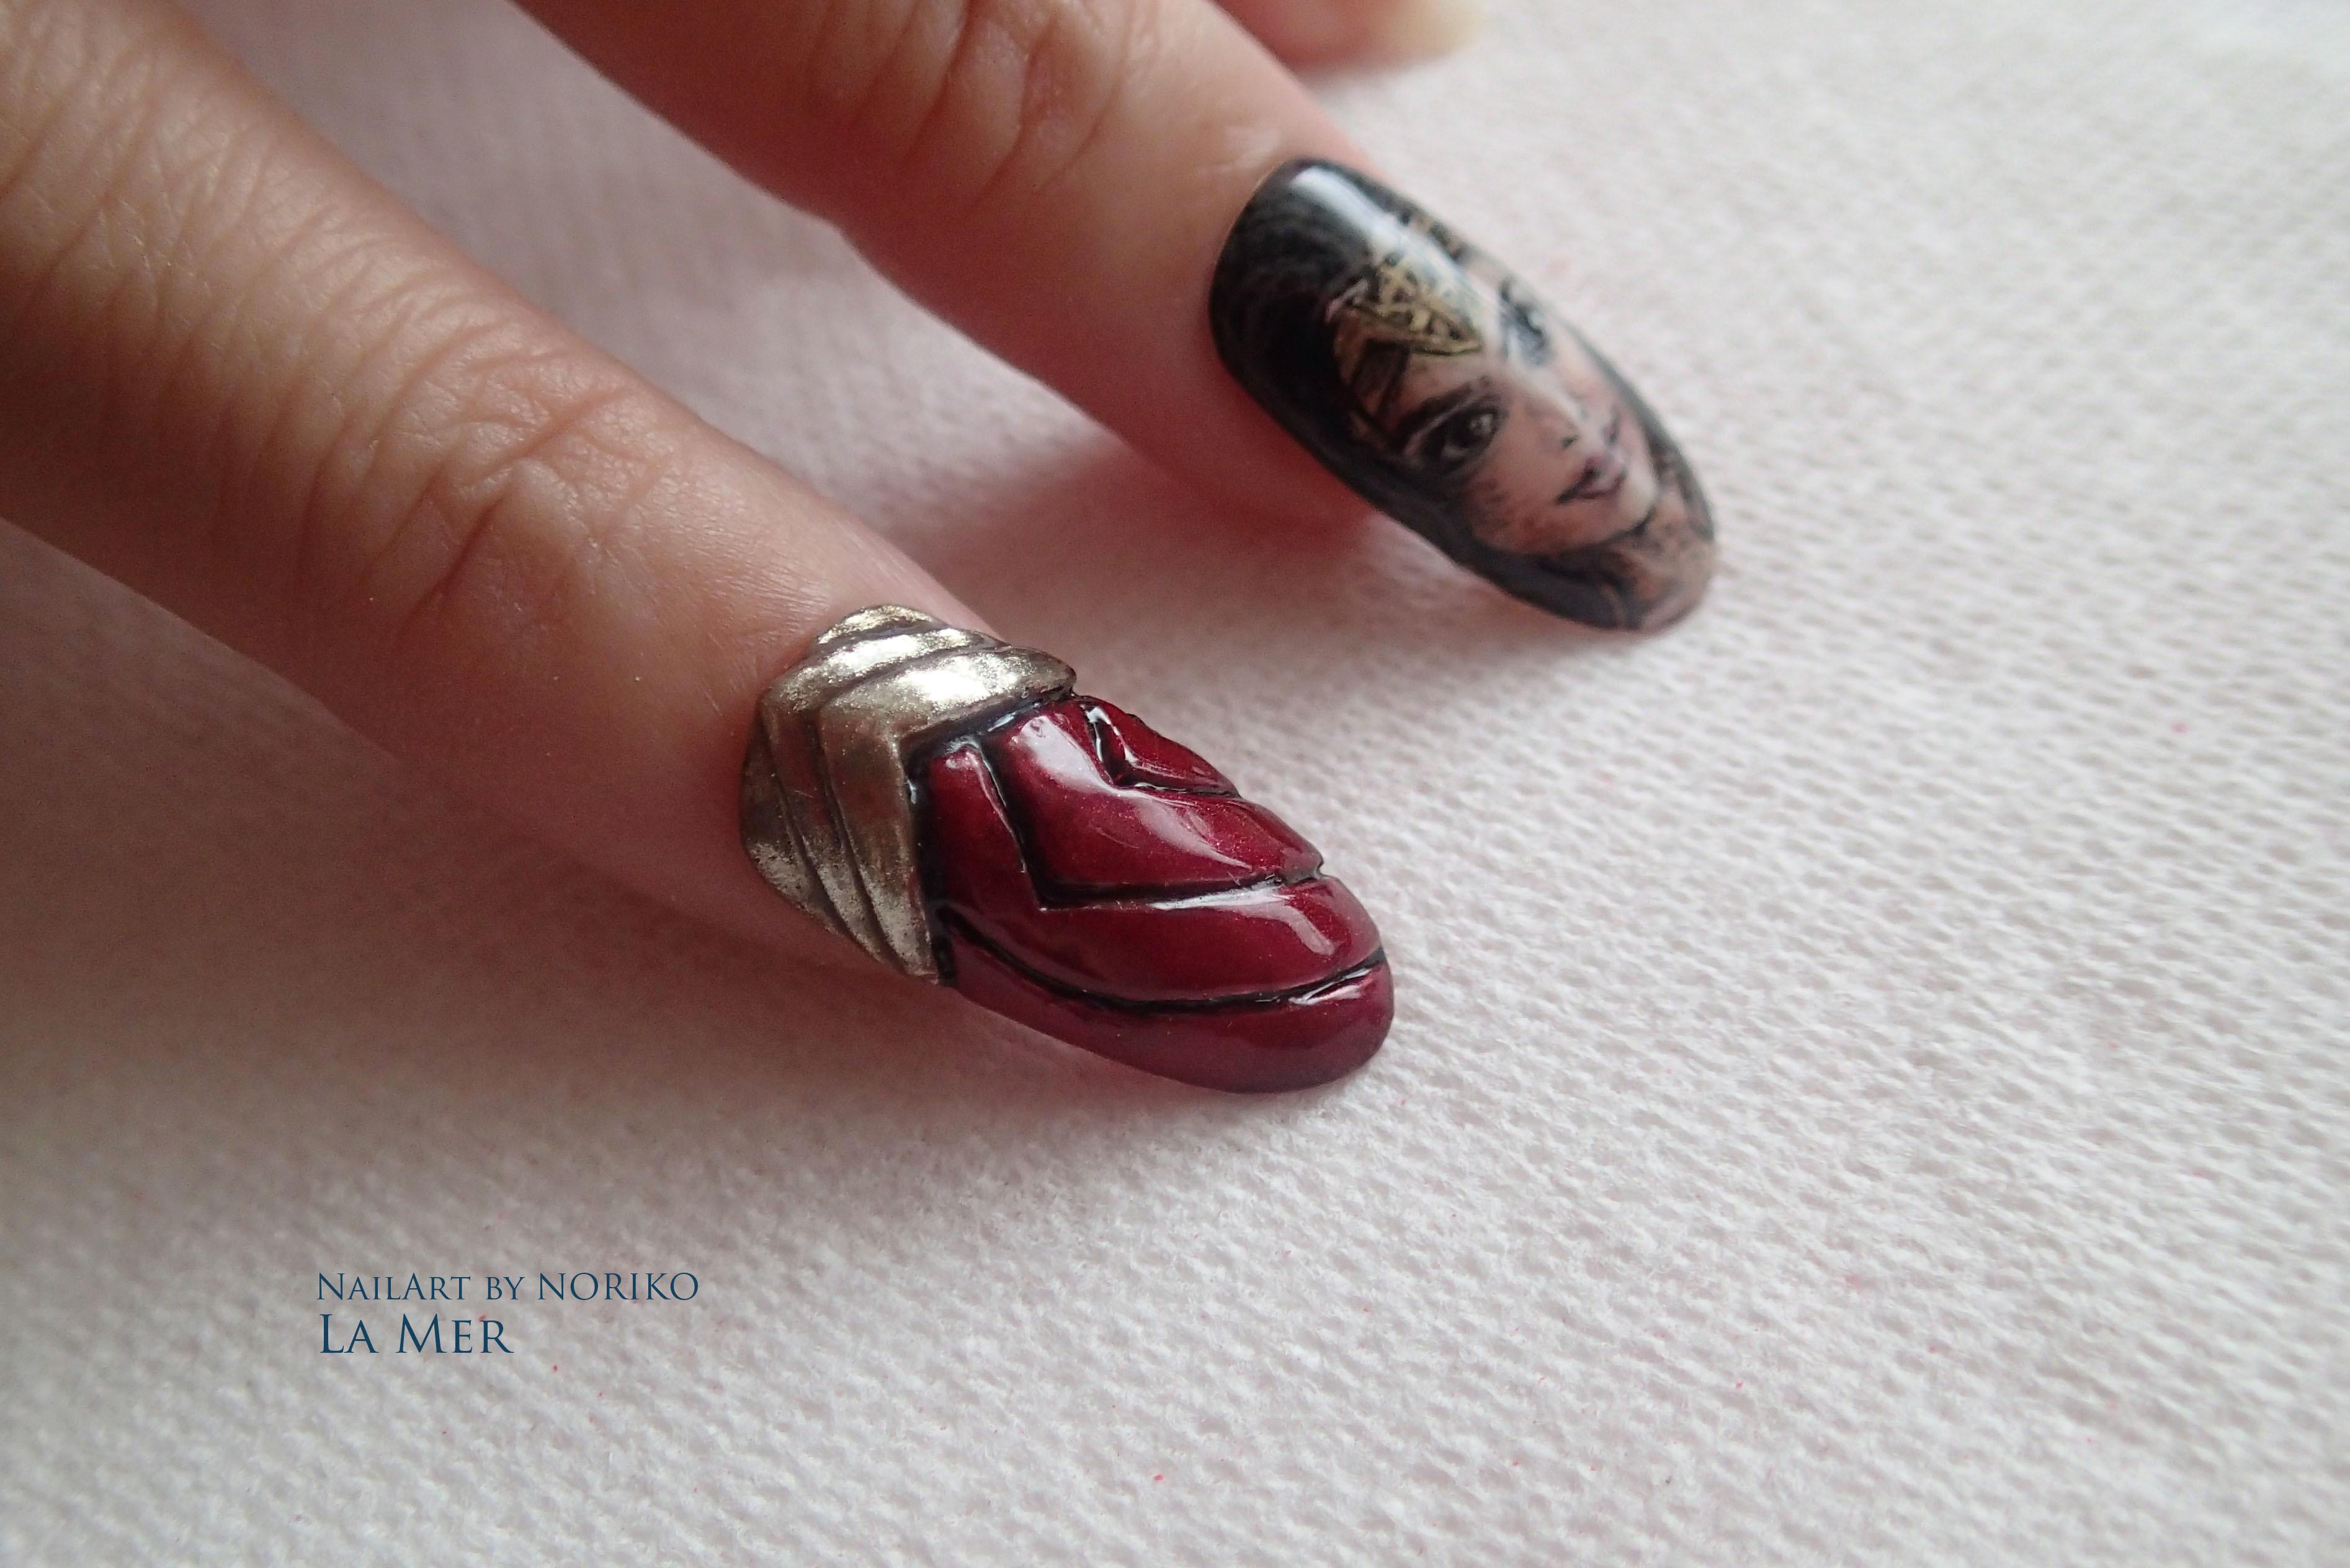 Nail Artist : NORIKO WONDER WOMAN6